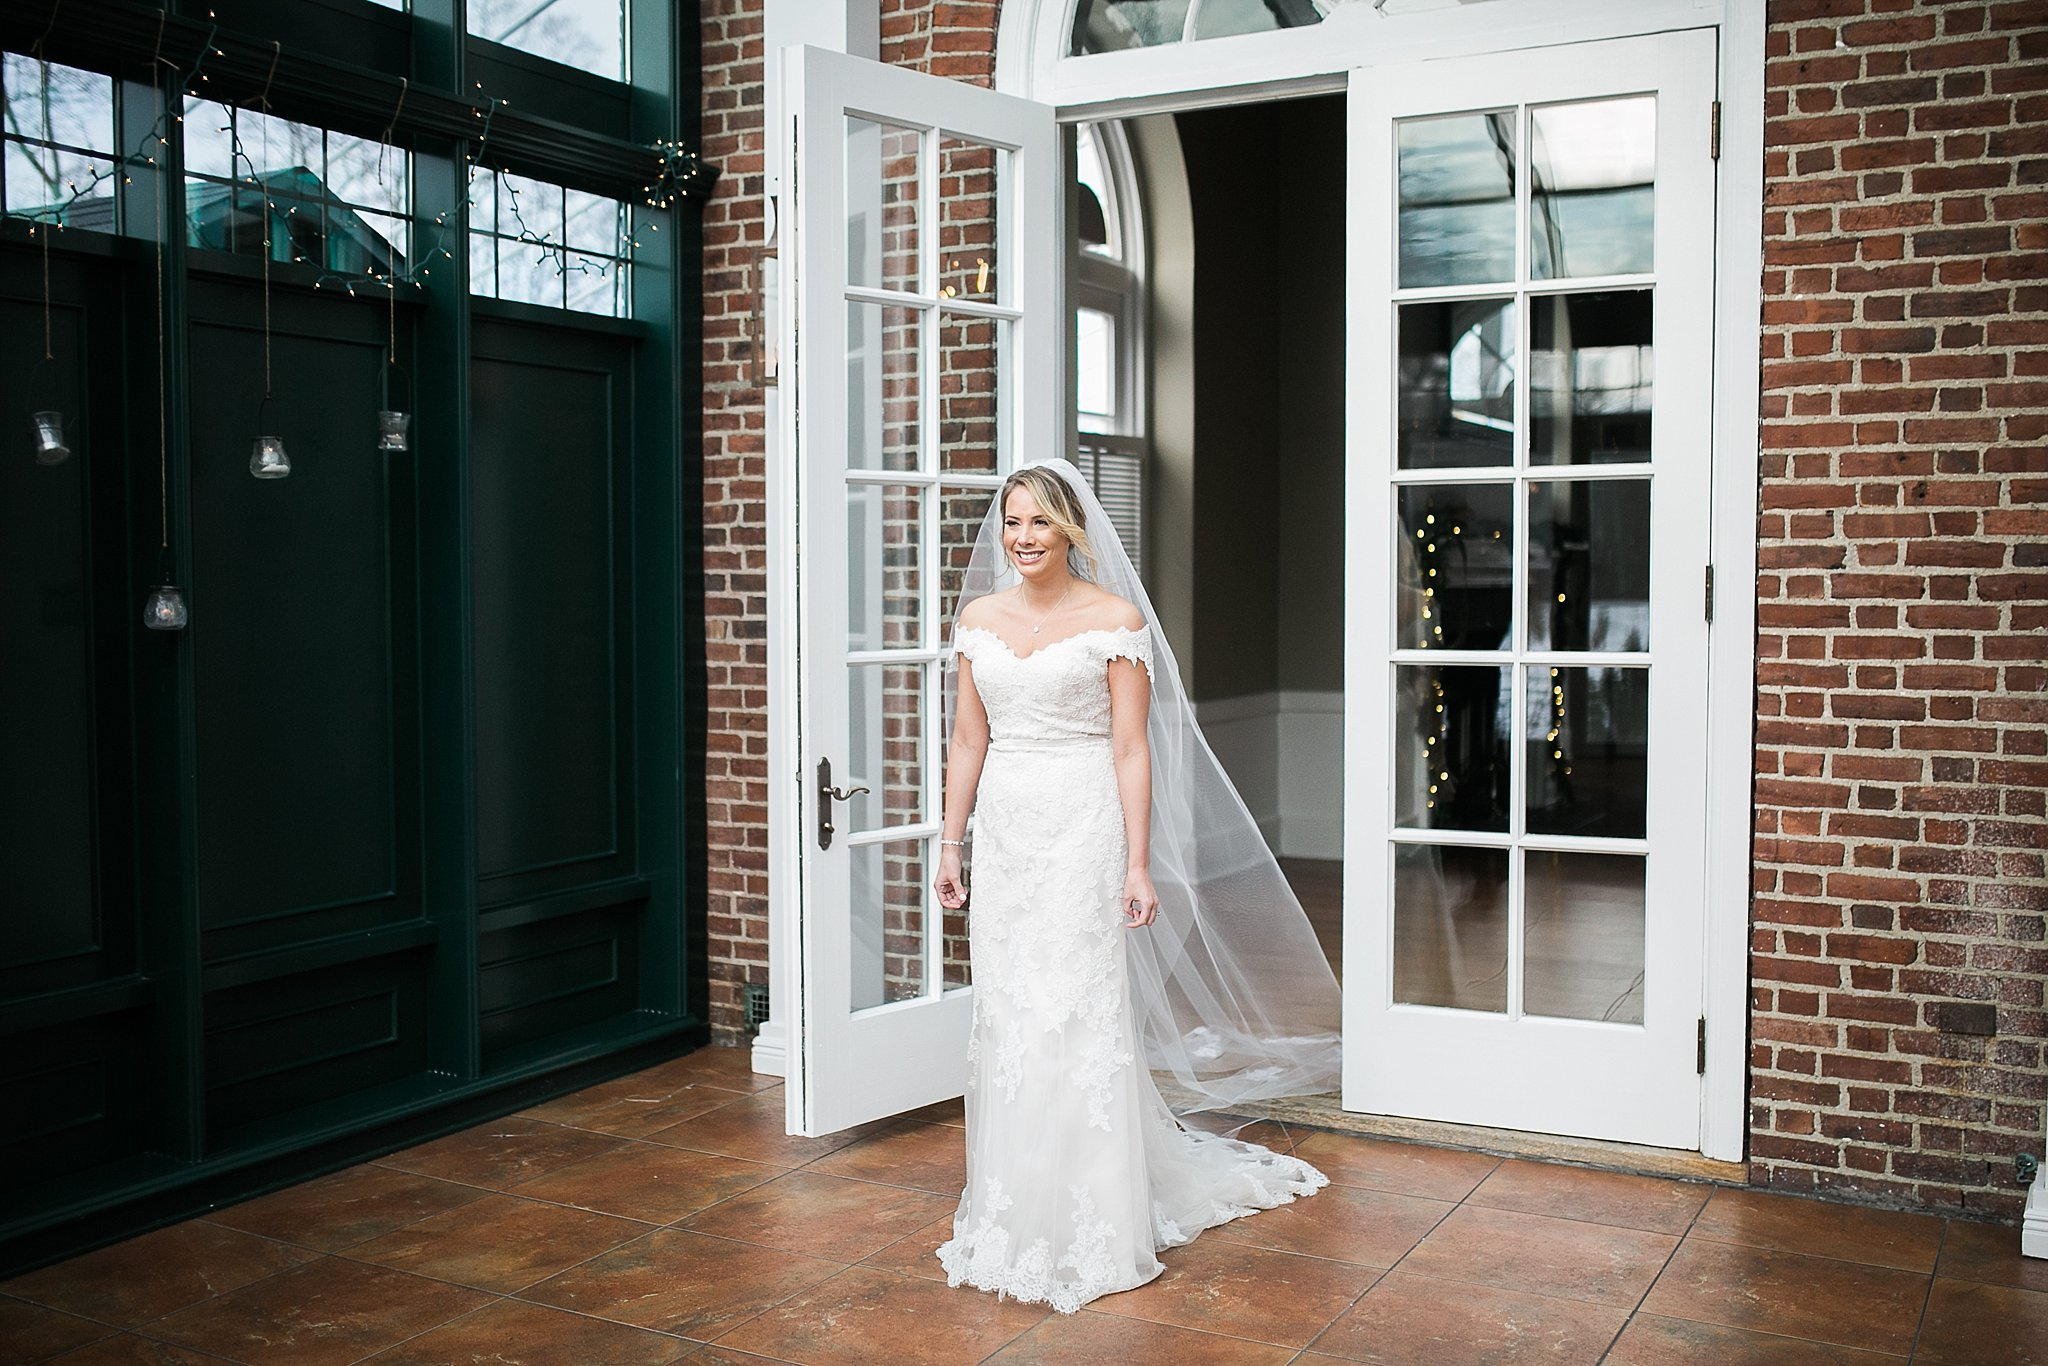 Highland Country Club Wedding Hudson Valley Wedding Photographer Sweet Alice Photography 25.jpg